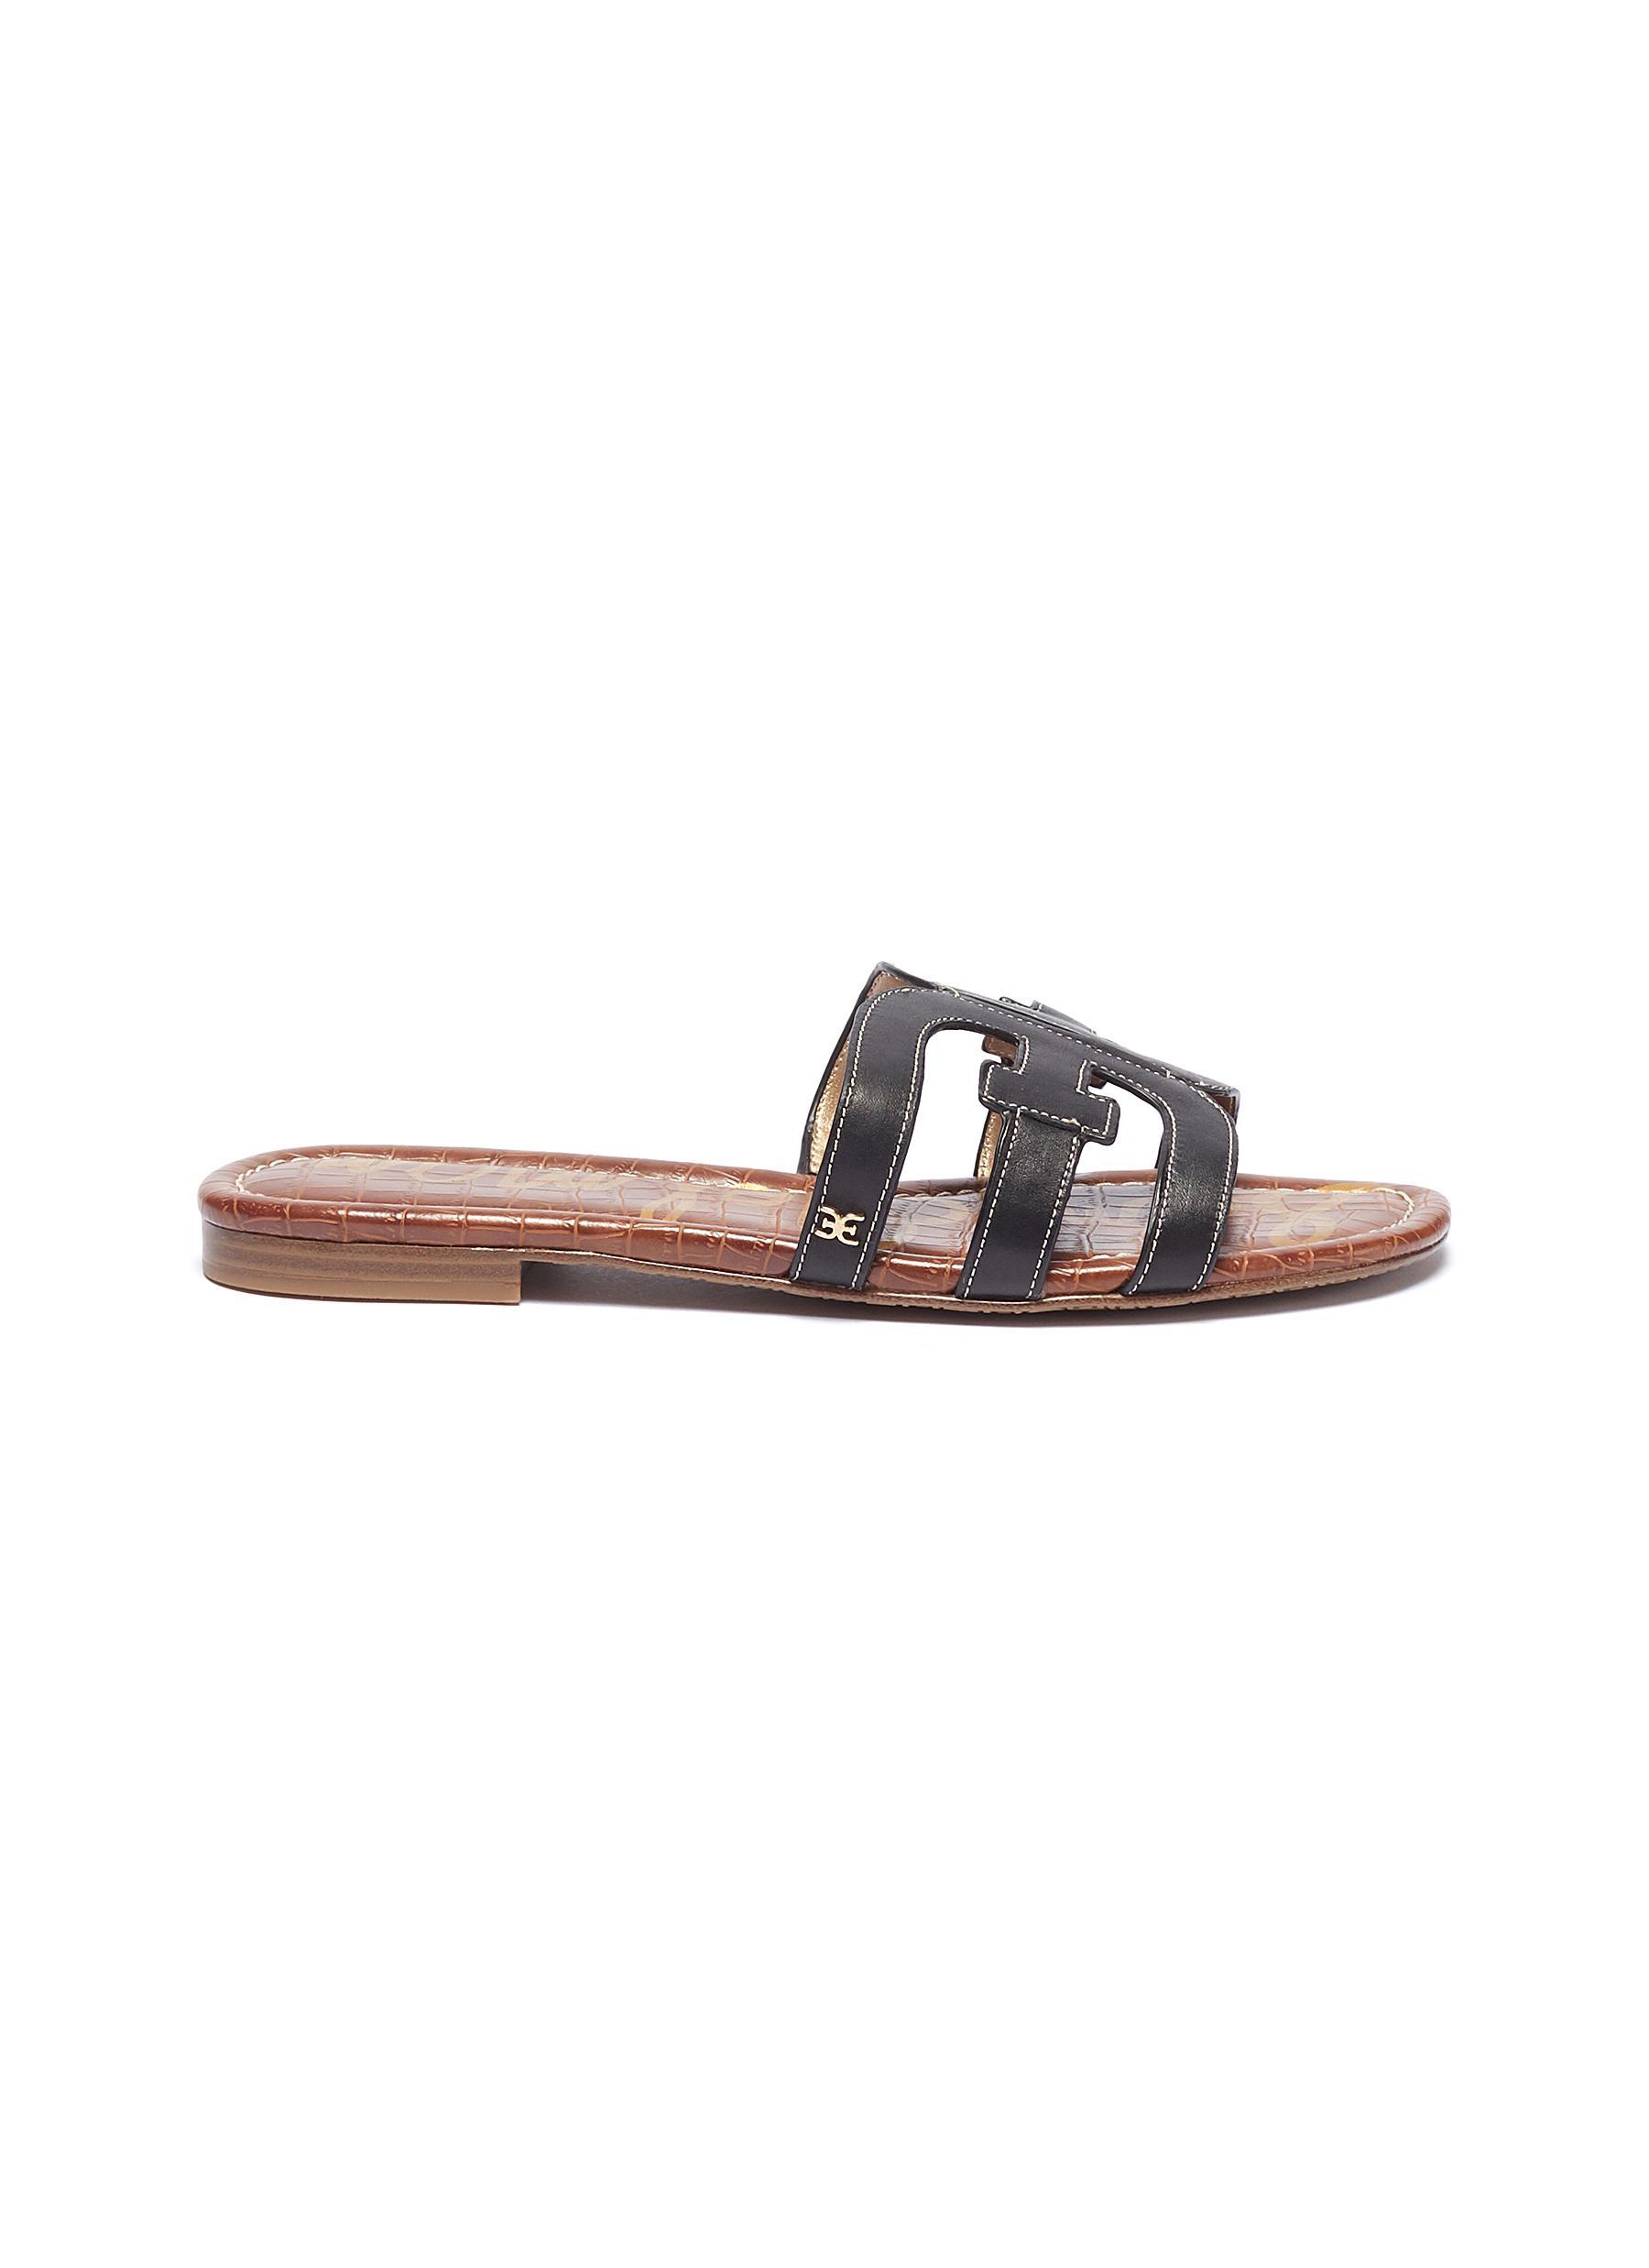 Bay leather slide sandals by Sam Edelman